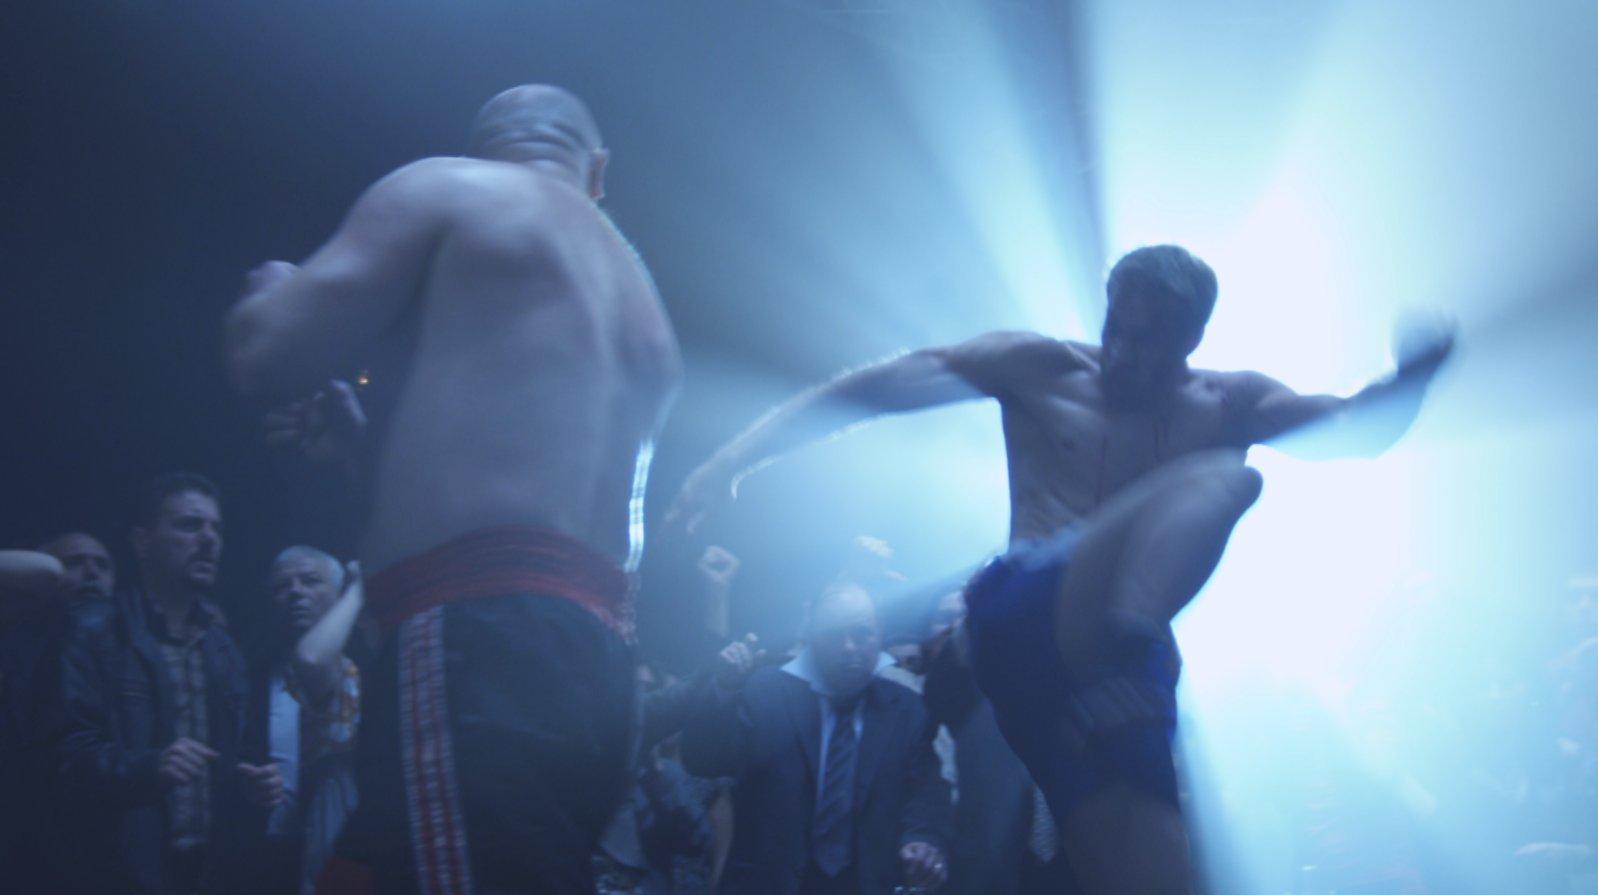 مشاهدة فيلم Forced To Fight 2011 HD مترجم كامل اون لاين